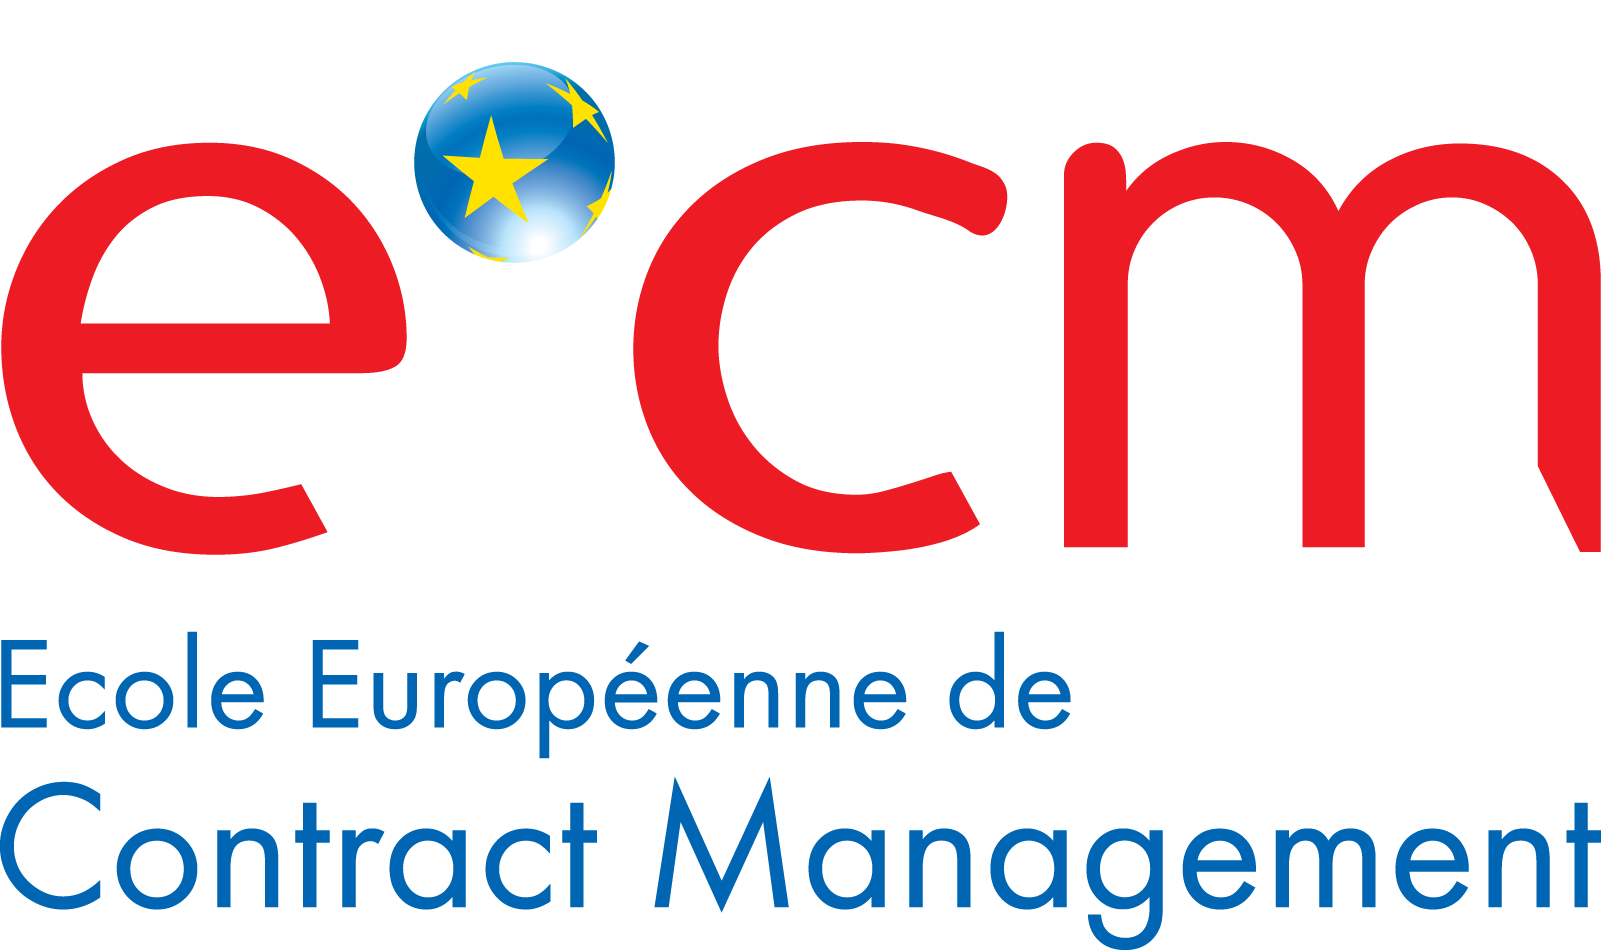 e2cm - Ecole Européenne de Contract Mana...